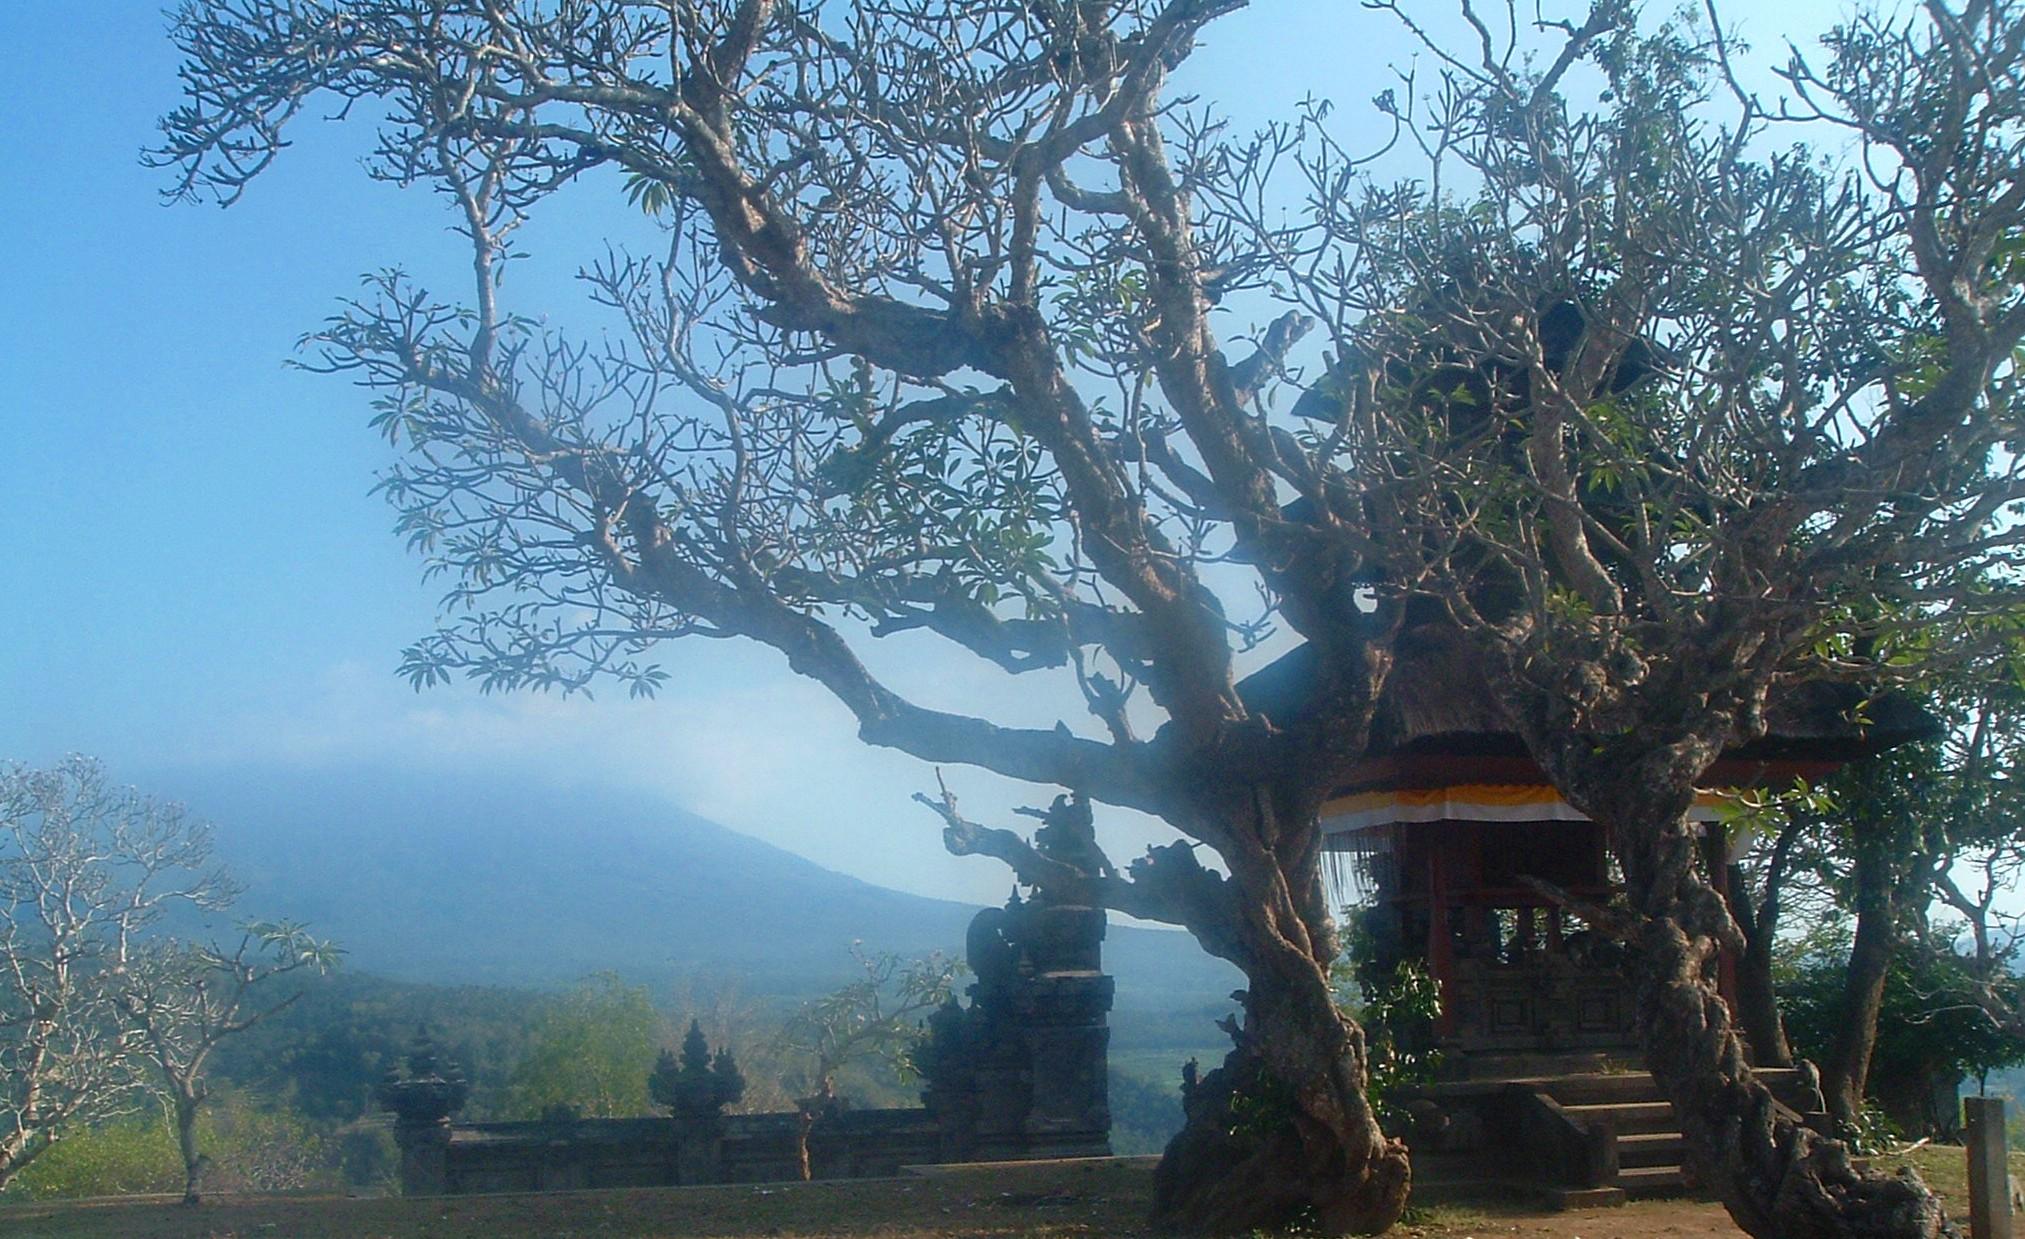 hilltop temple.JPG